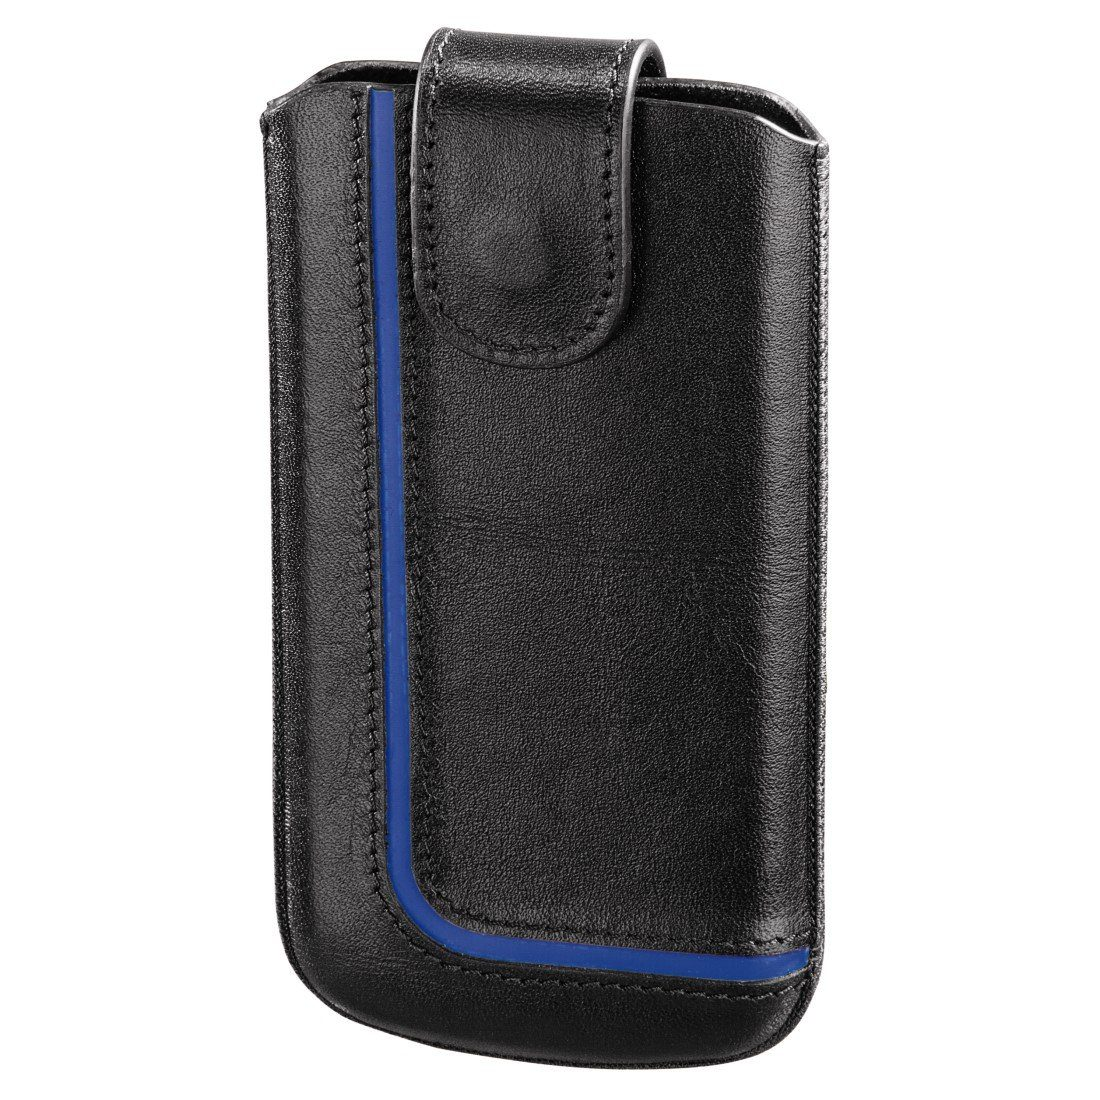 Hama Handy-Sleeve Neon Black, Gr. M, Schwarz/Blau